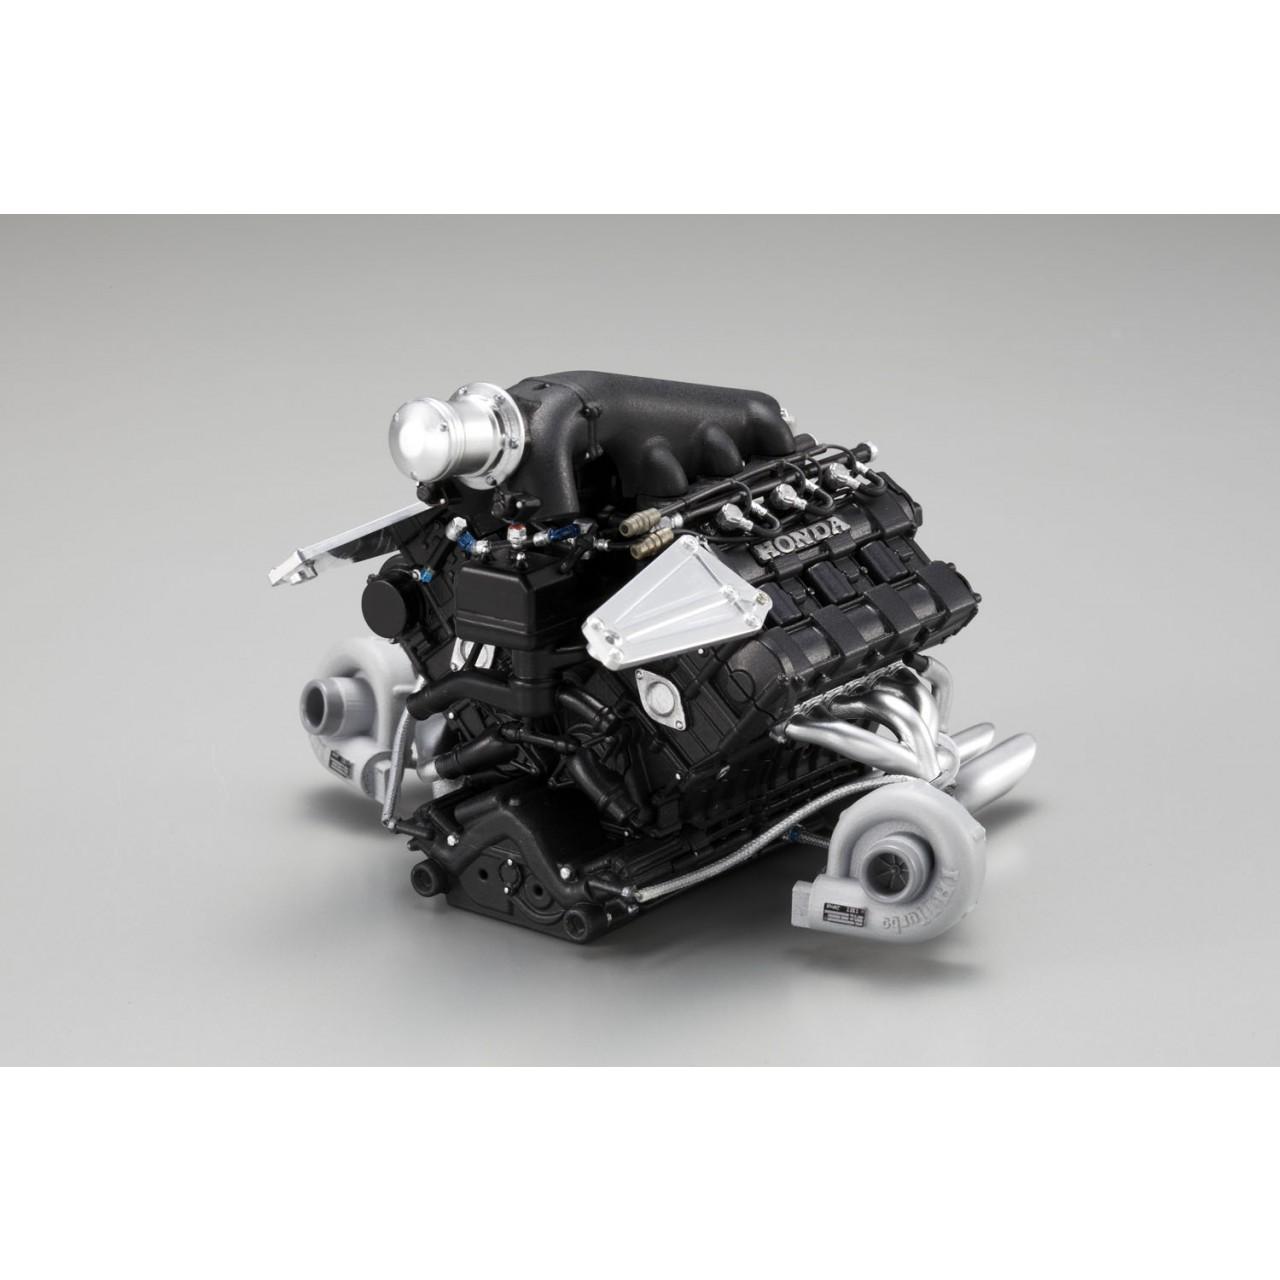 Build Your Own Car Kit >> Senna McLaren MP4/4 | 1:8 Model Car | Full Kit | ModelSpace